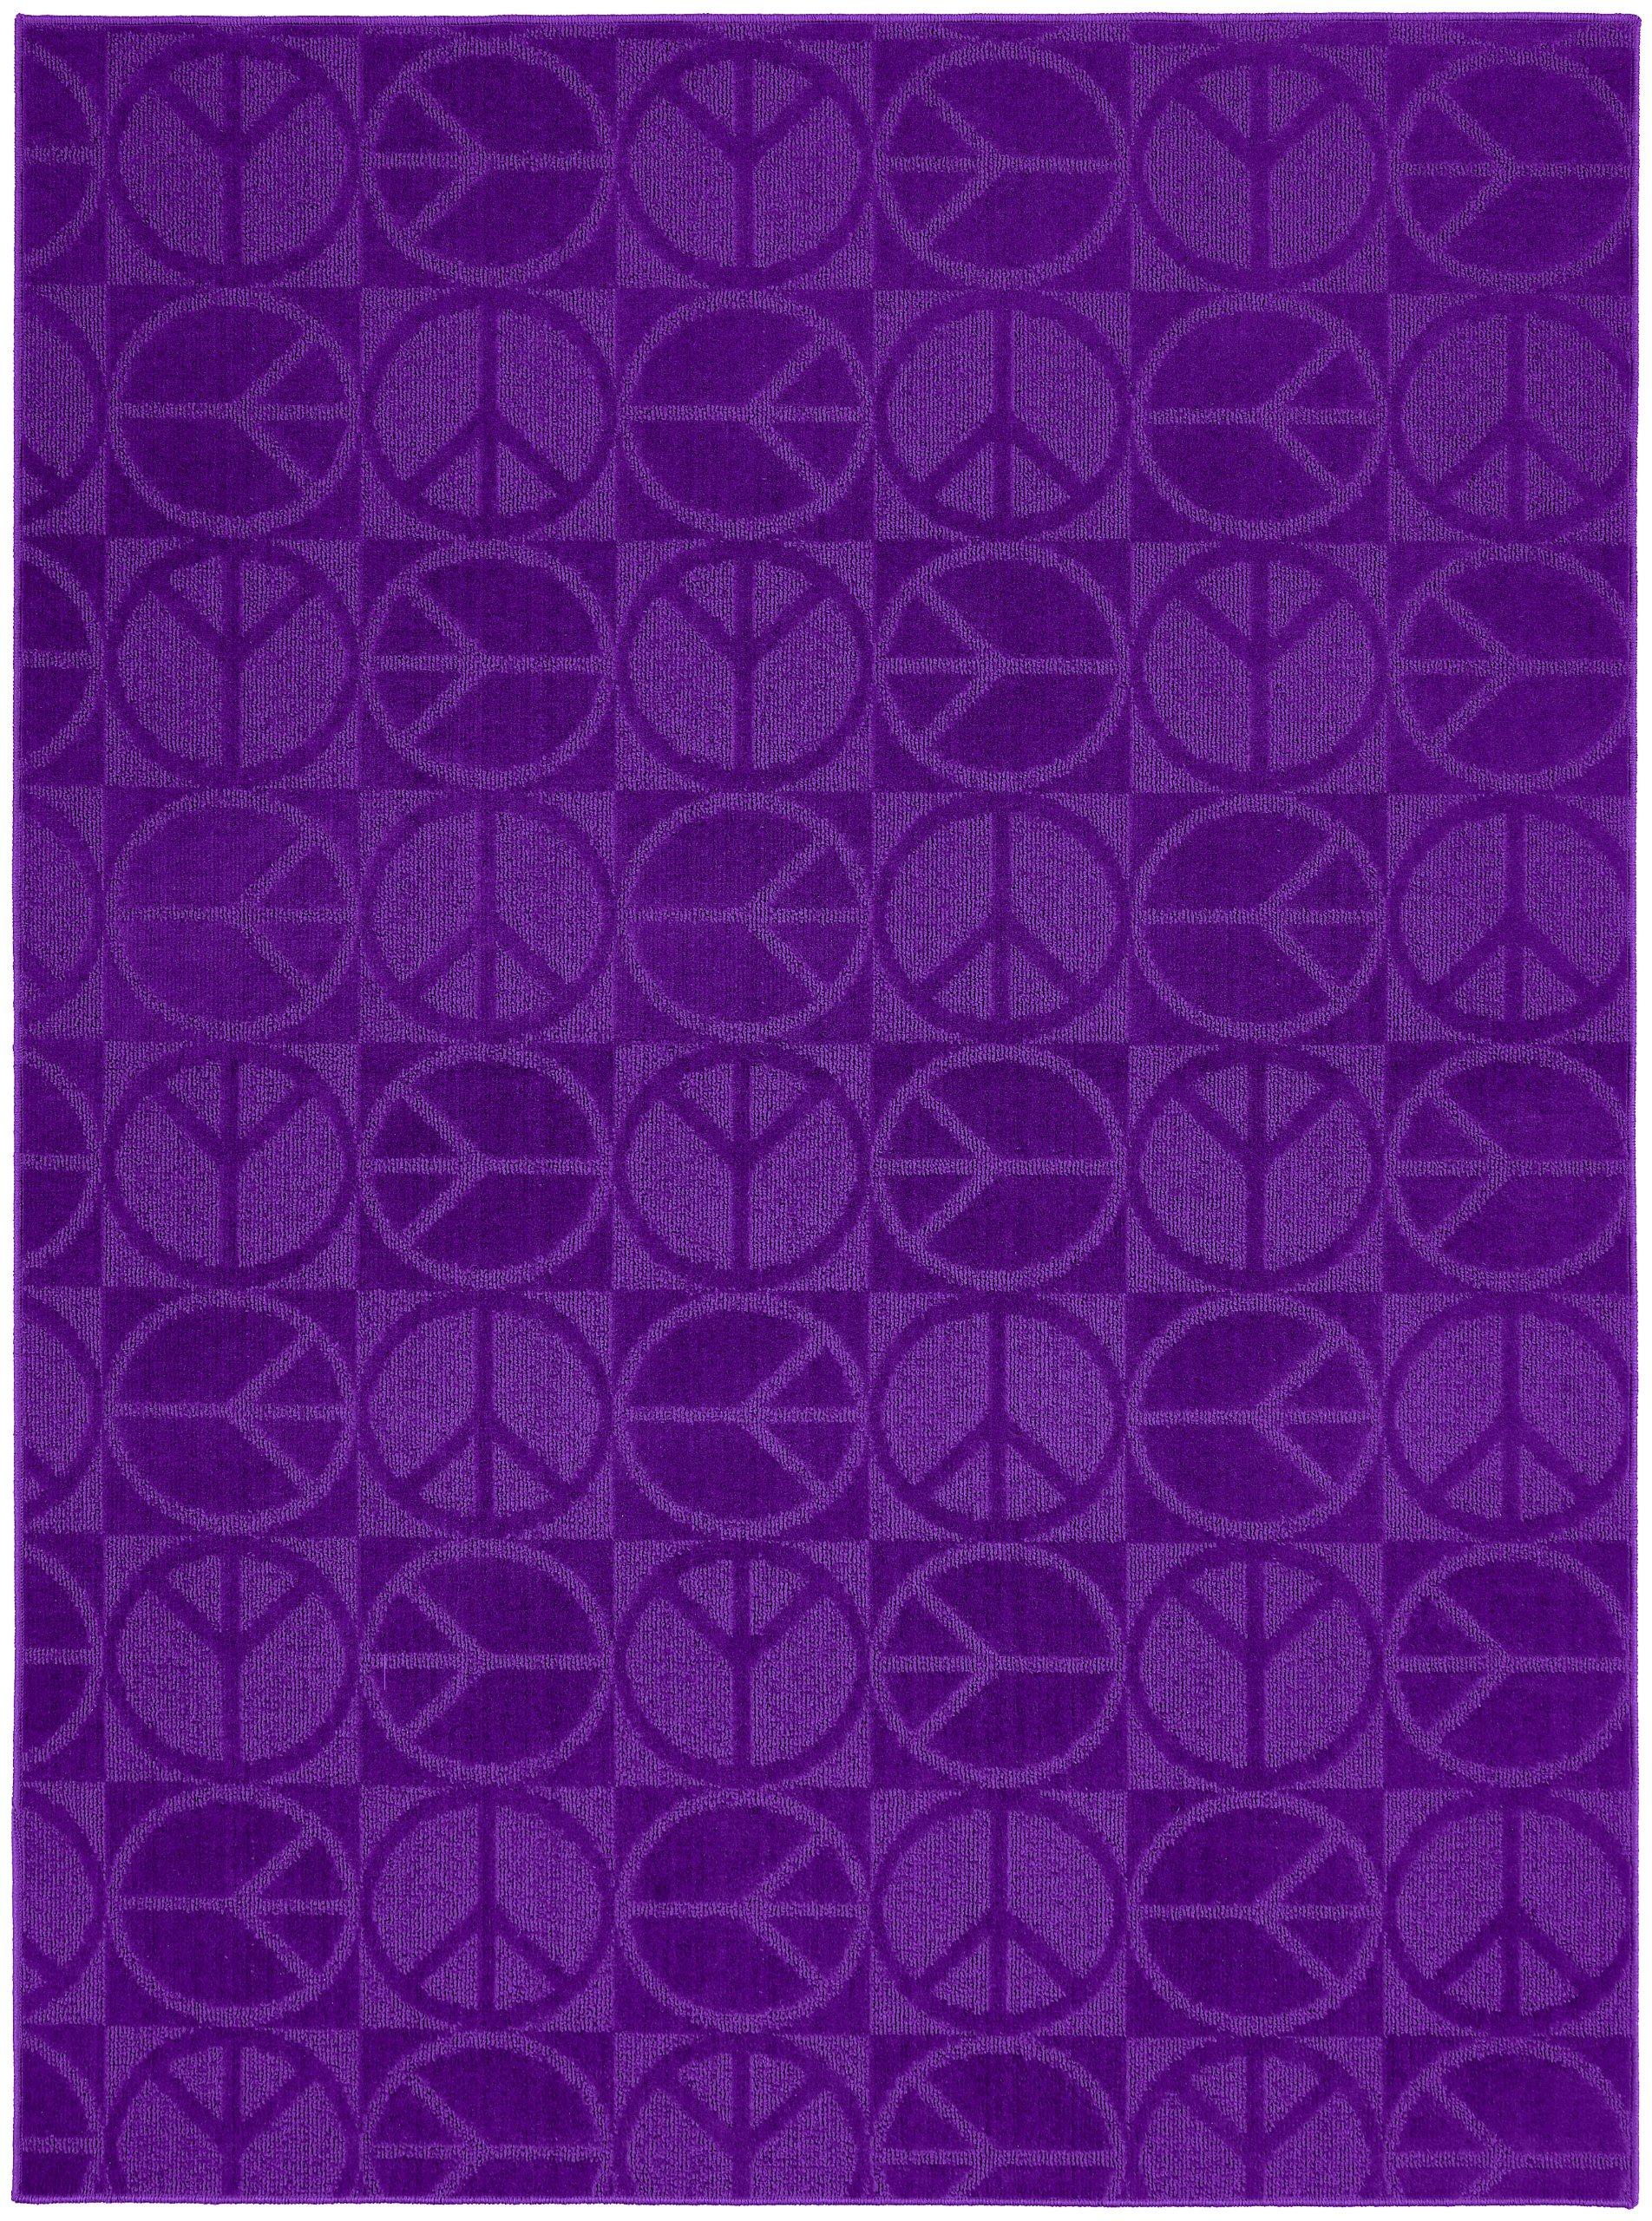 Garland Rug Large Peace Area Rug, 7-Feet 6-Inch by 9-Feet 6-Inch, Purple